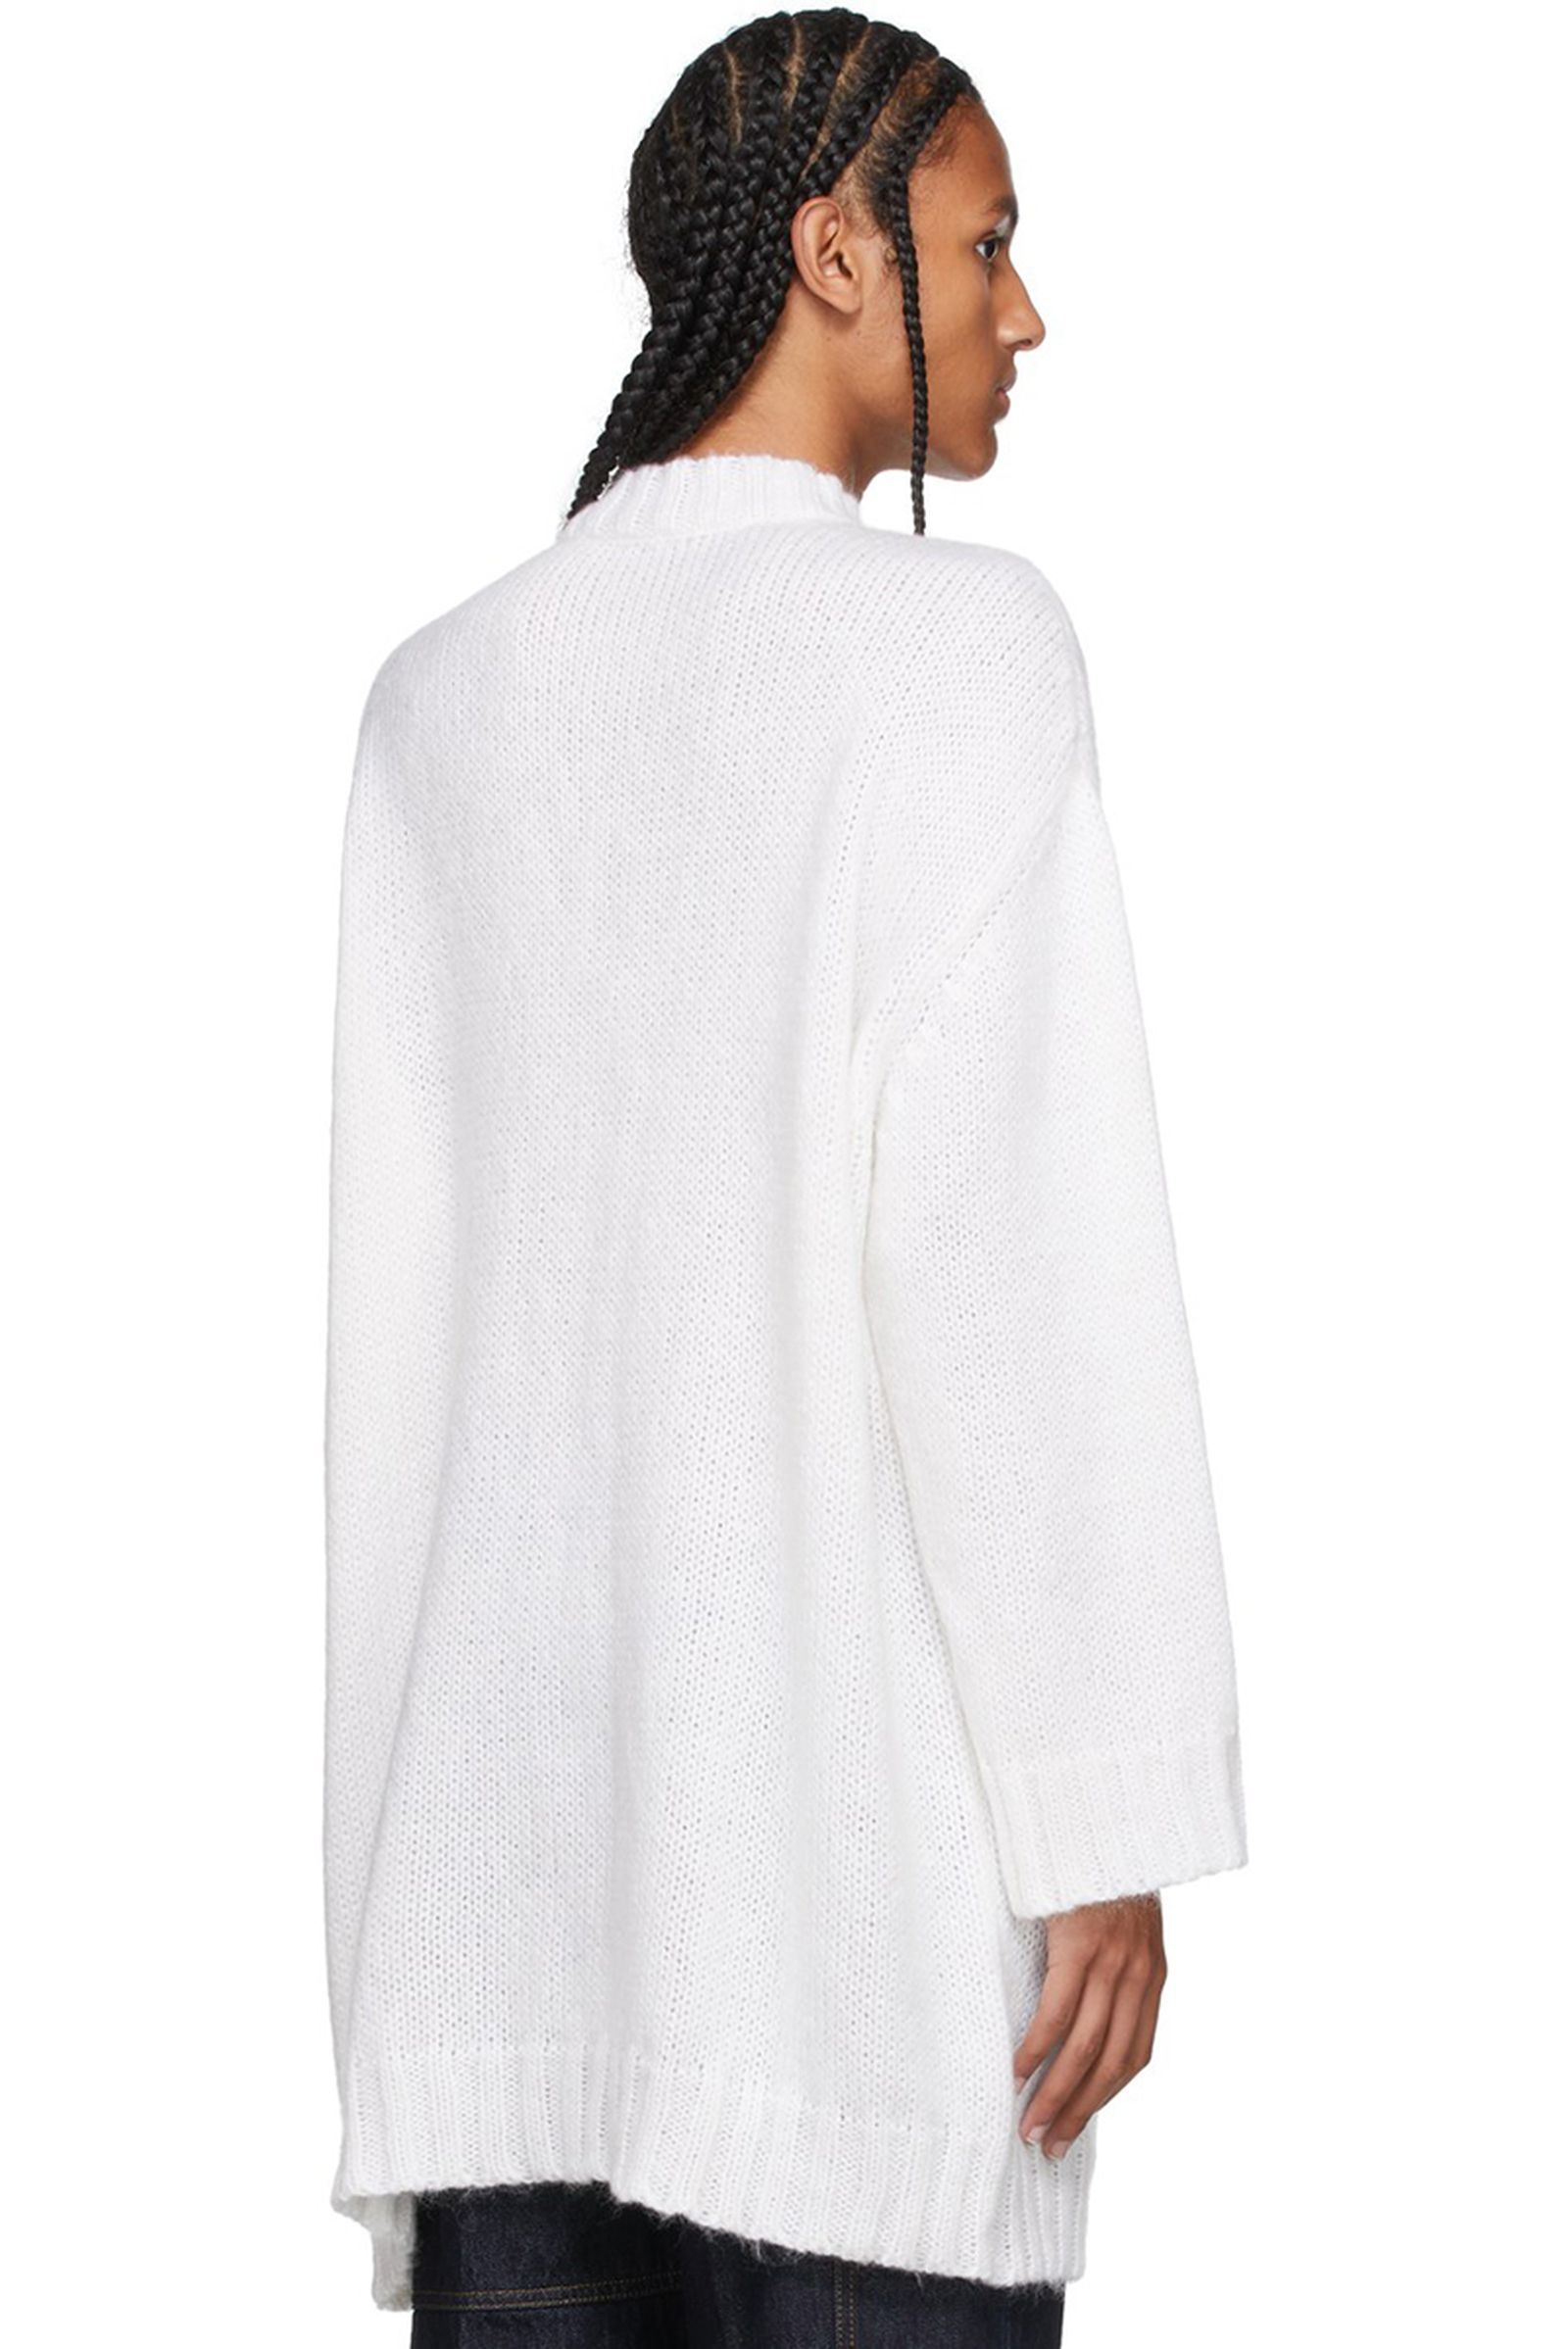 jw-anderson-radish-sweater fw21 (4)